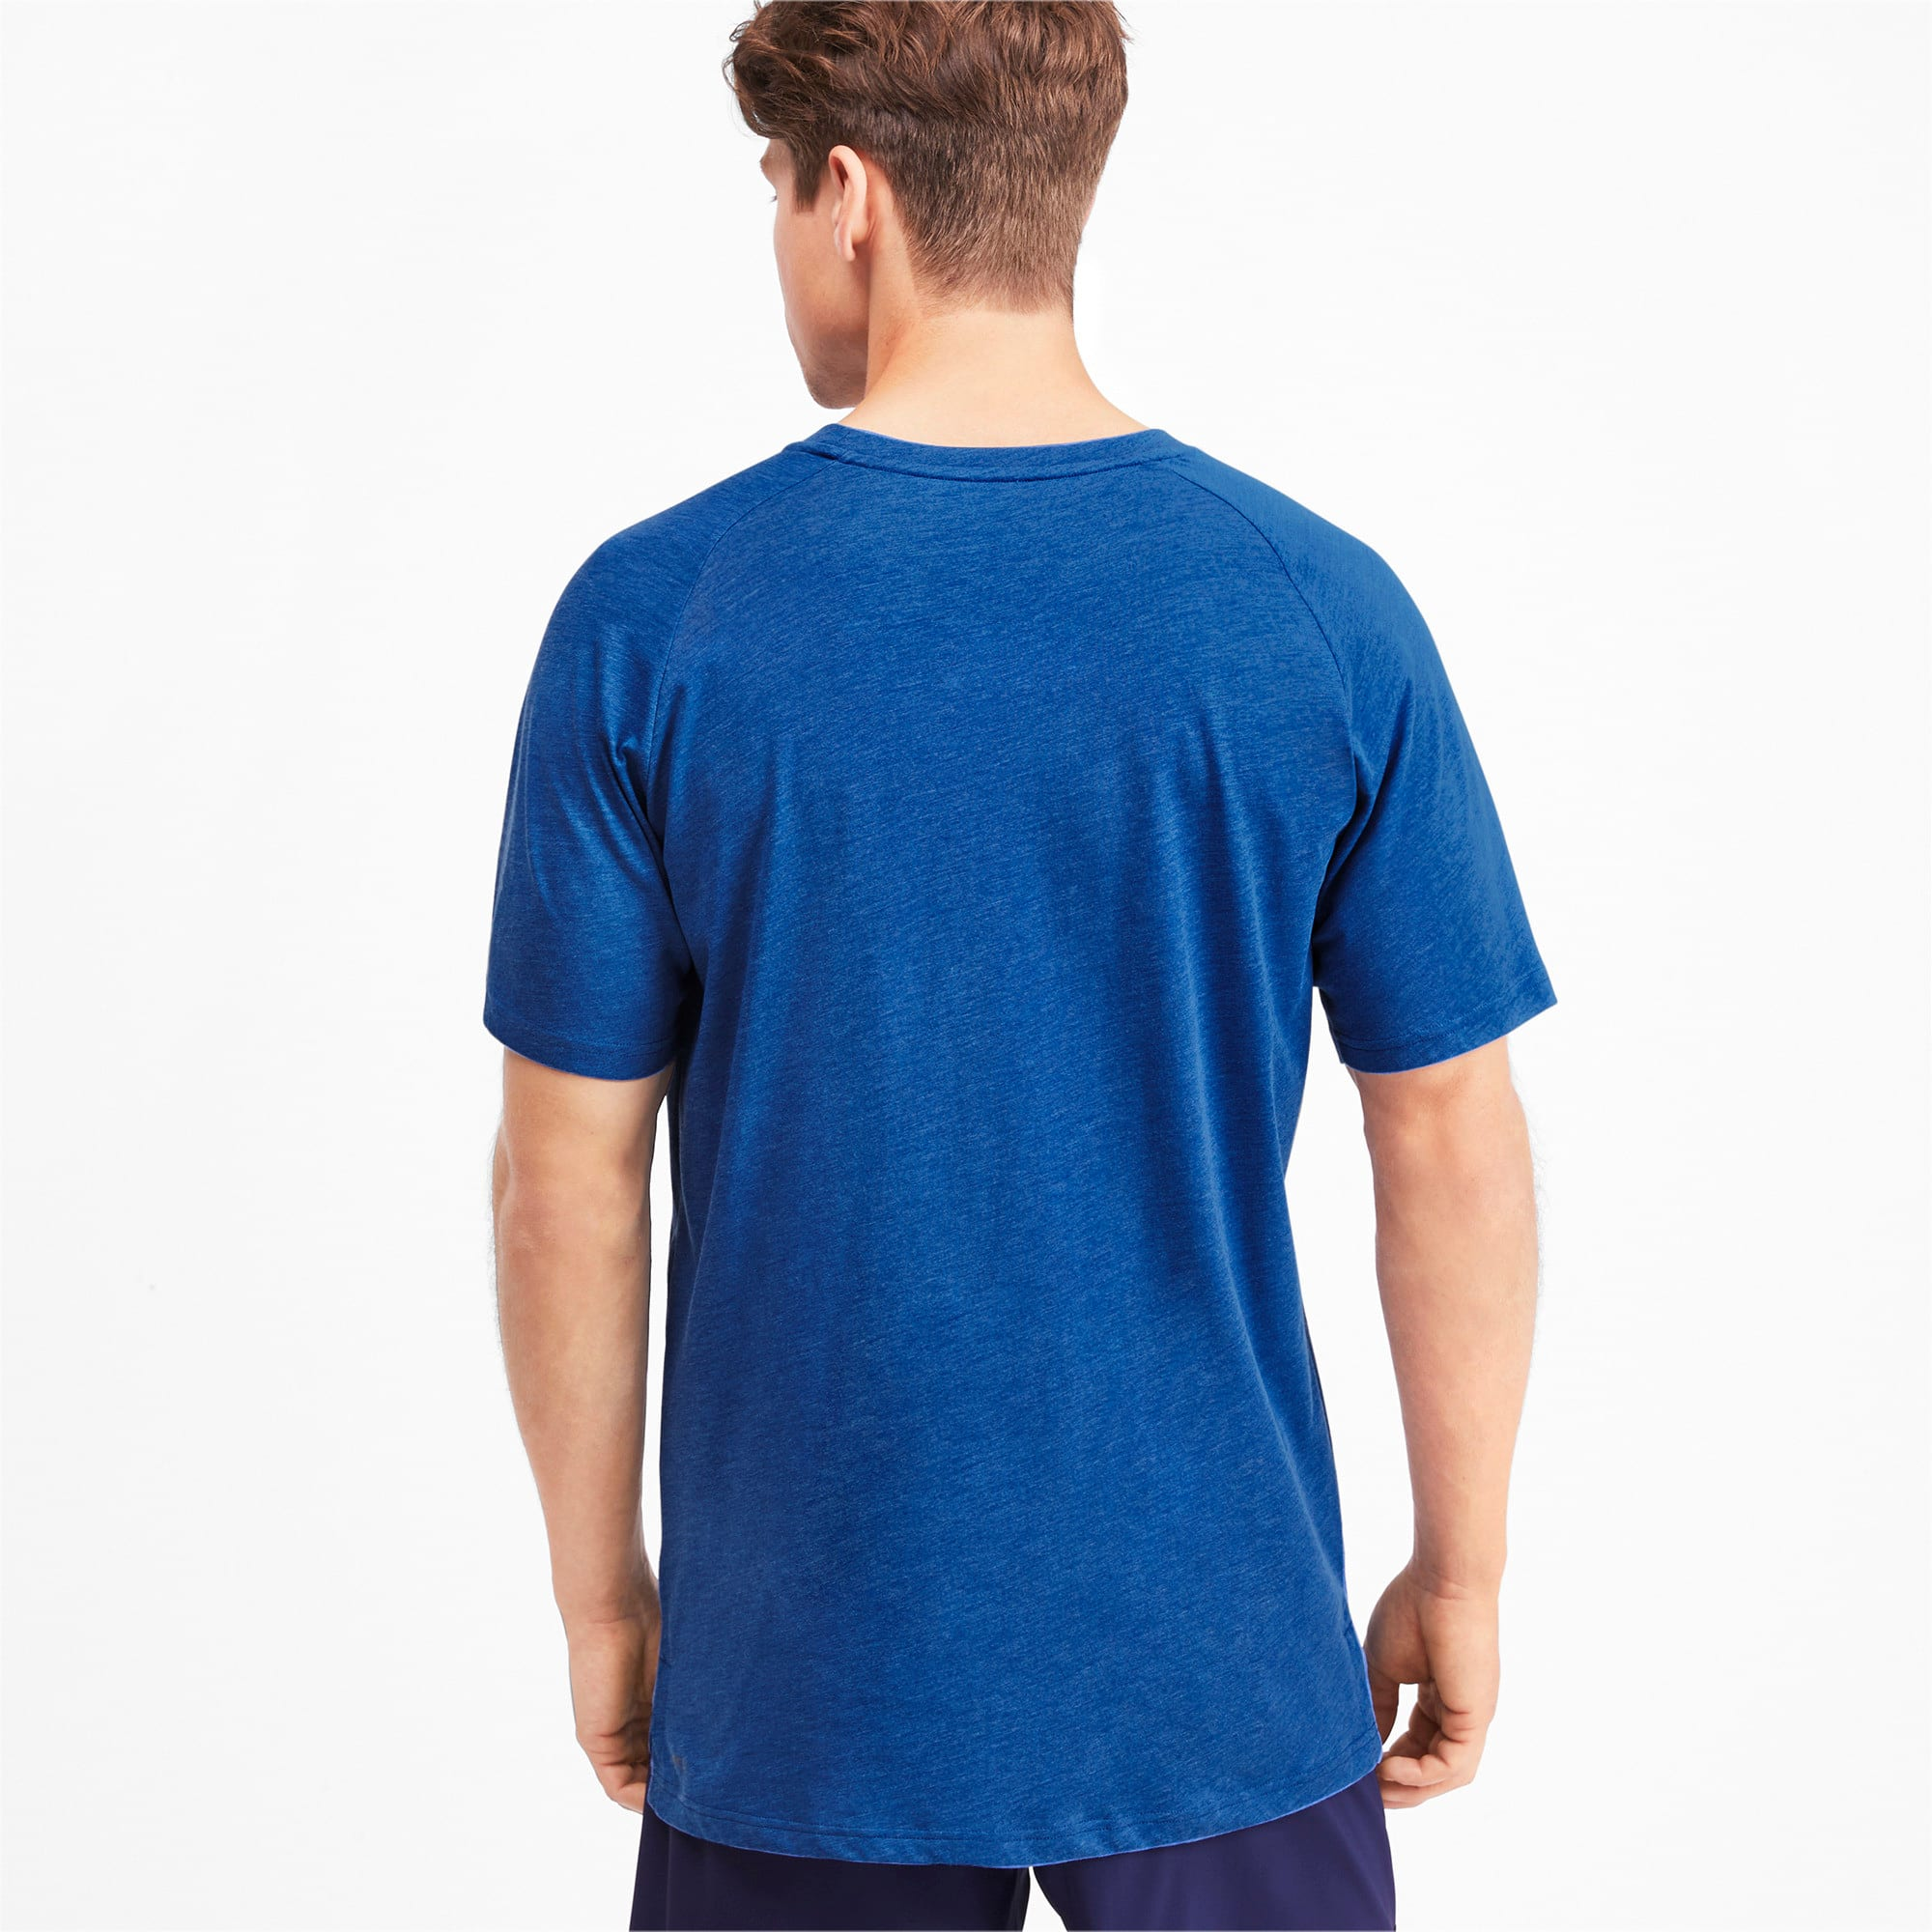 Thumbnail 2 of Reactive Short Sleeve Men's Training Tee, Galaxy Blue Heather, medium